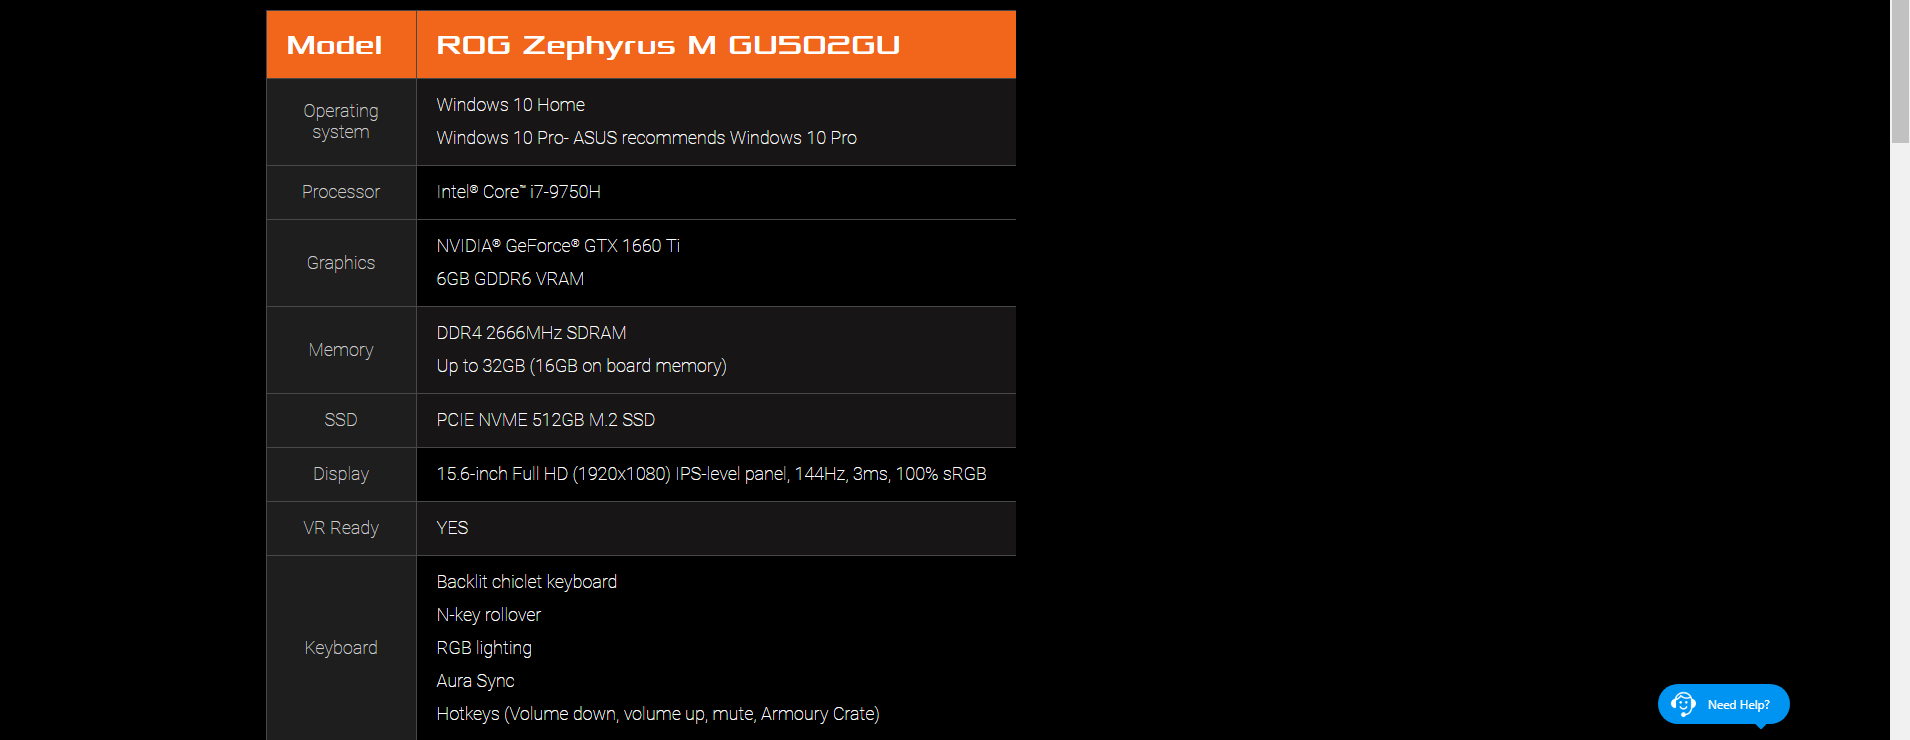 (UPGRADED)ASUS ROG ZEPHYRUS M GU502G-UES022T I7-9750H 16G/12GD4 512SSD  GTX1660TI 6GD6 WIN10H BLACK